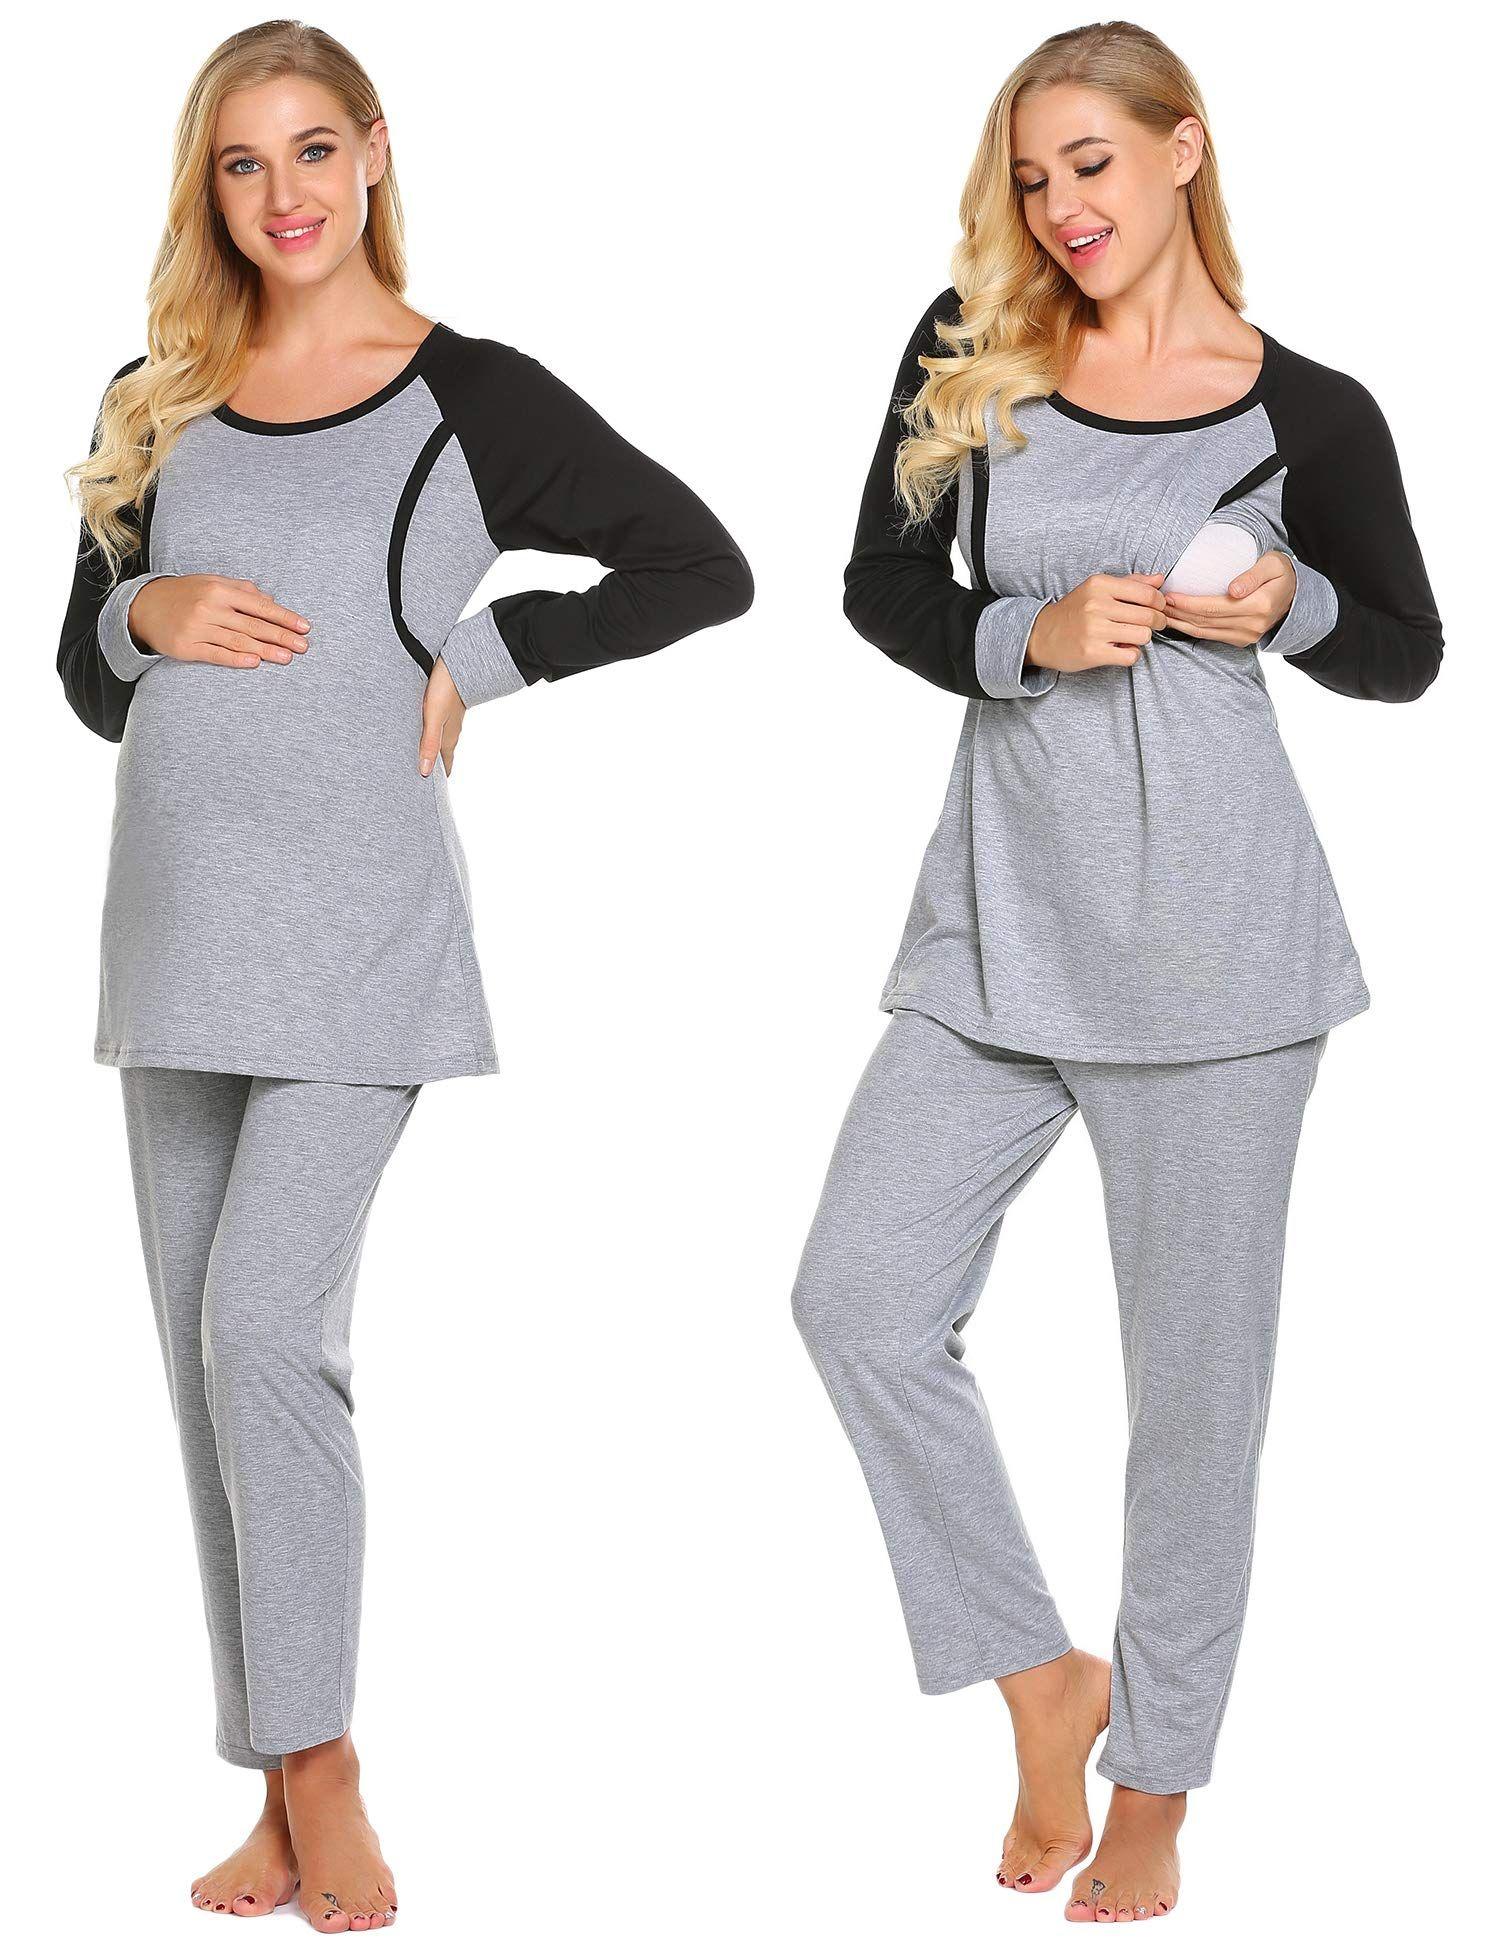 4a08e5cc28990 Ekouaer Women Nursing Pajamas Hospital Maternity PJS Set Pregnancy Breastfeeding  Sleepwear,Pink,Large